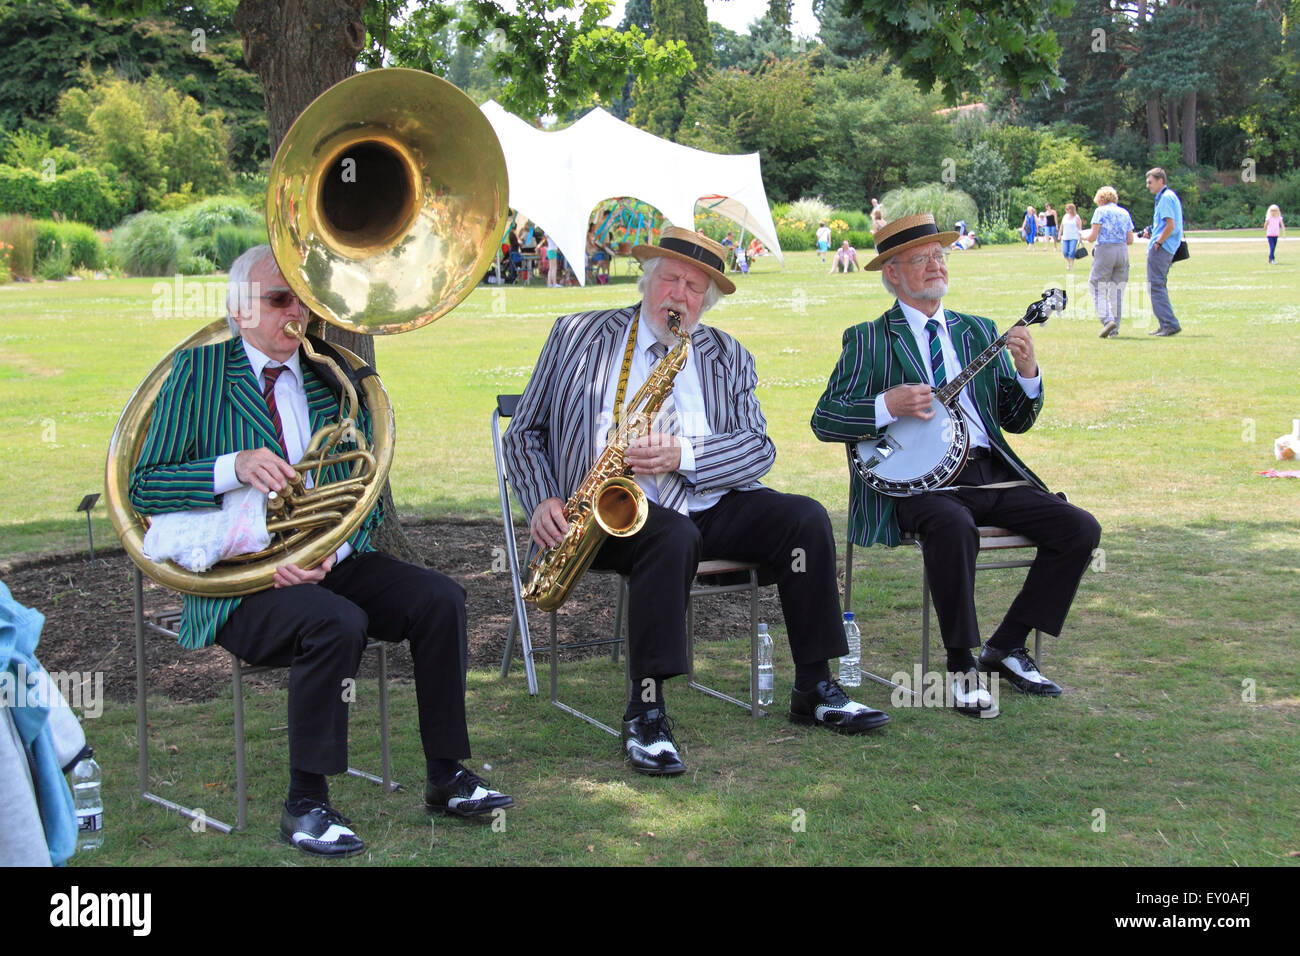 Jazz Magic at Royal Horticultural Society Arts Fest, RHS Garden Wisley, Woking, Surrey, UK. 18th and 19th July 2015. - Stock Image